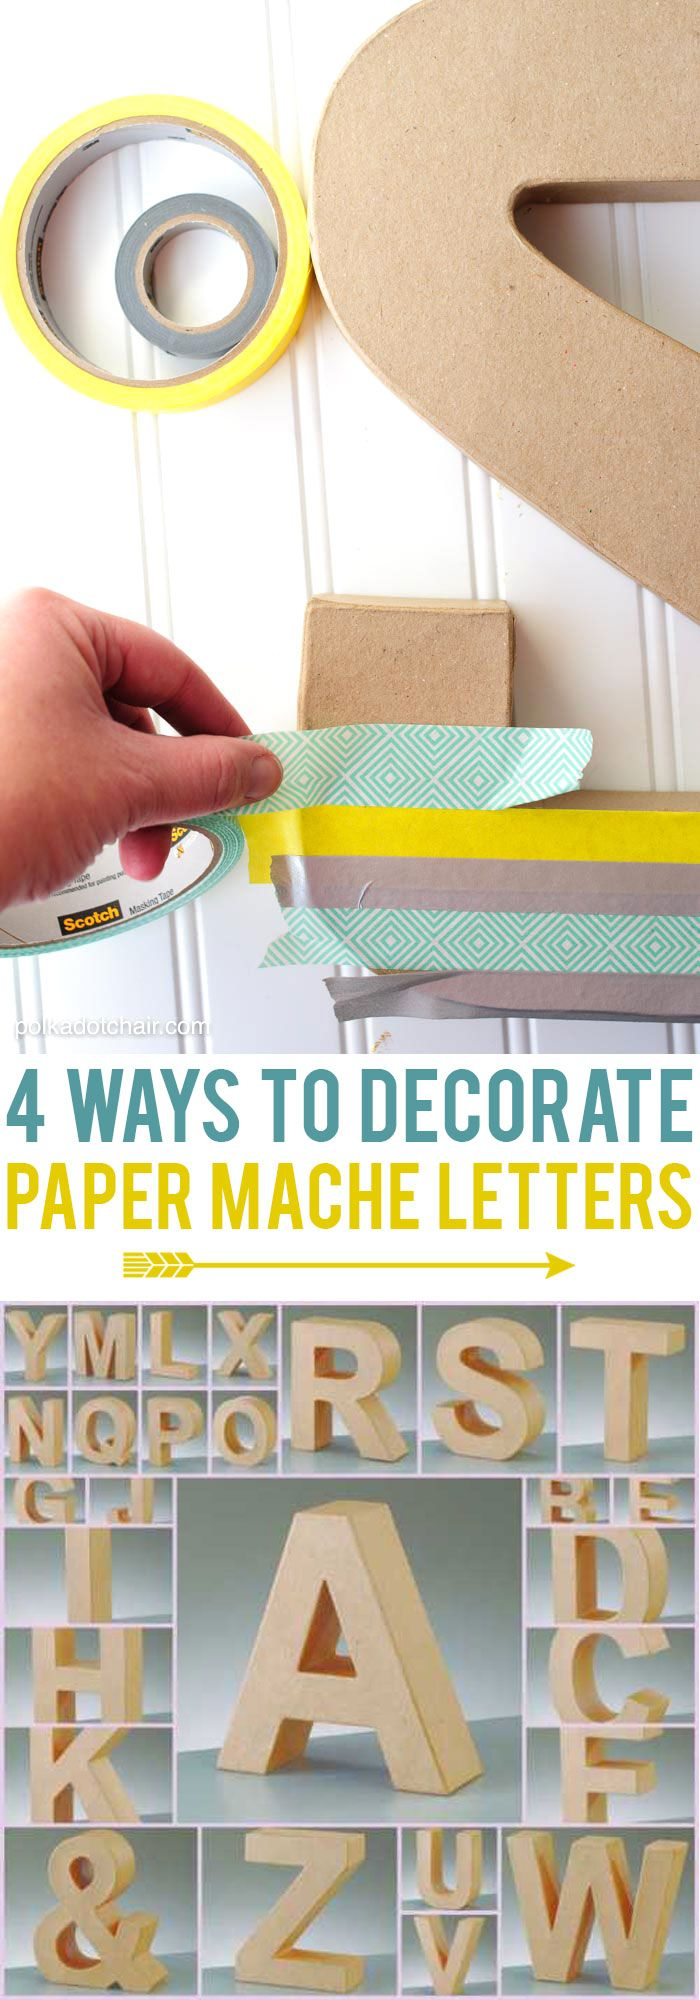 Best Paper Mache Letters Ideas Only On Pinterest Paper Mache